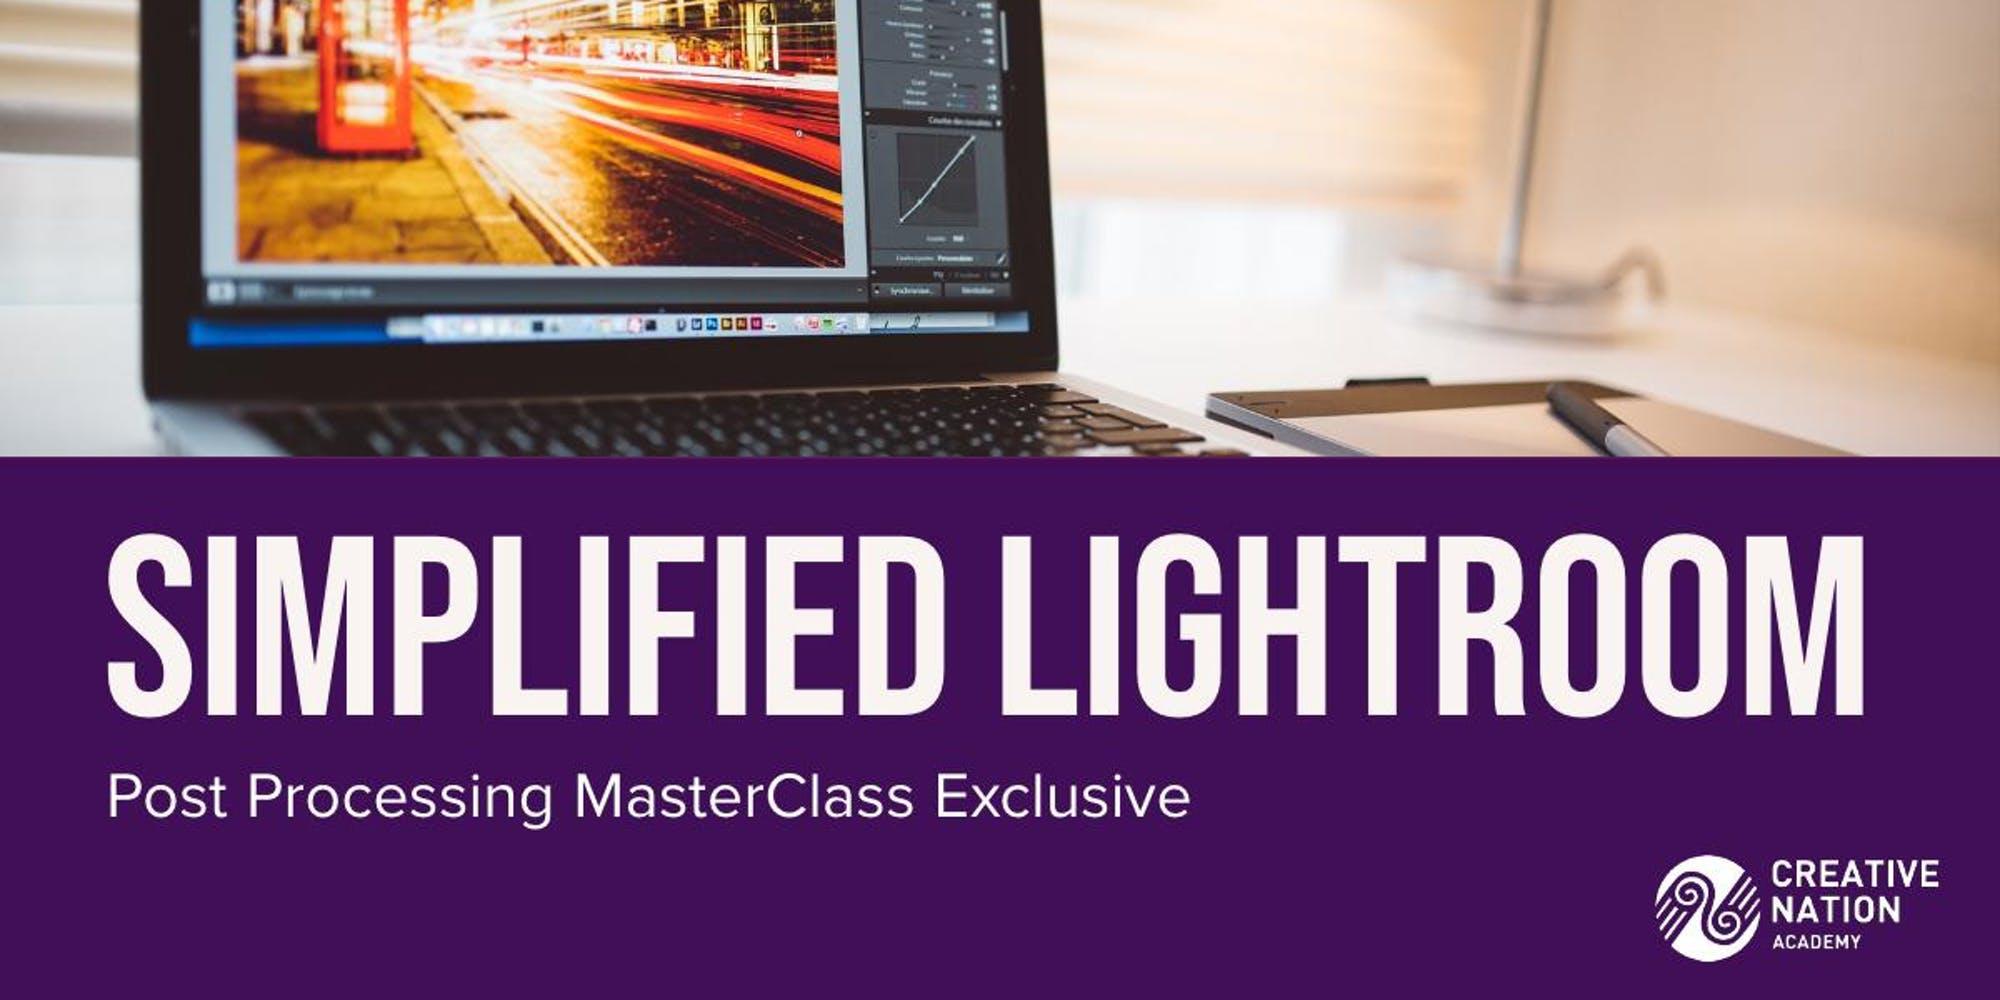 SIMPLIFIED LIGHTROOM: DIGITAL POST PROCESSING MASTERCLASS WORKSHOP